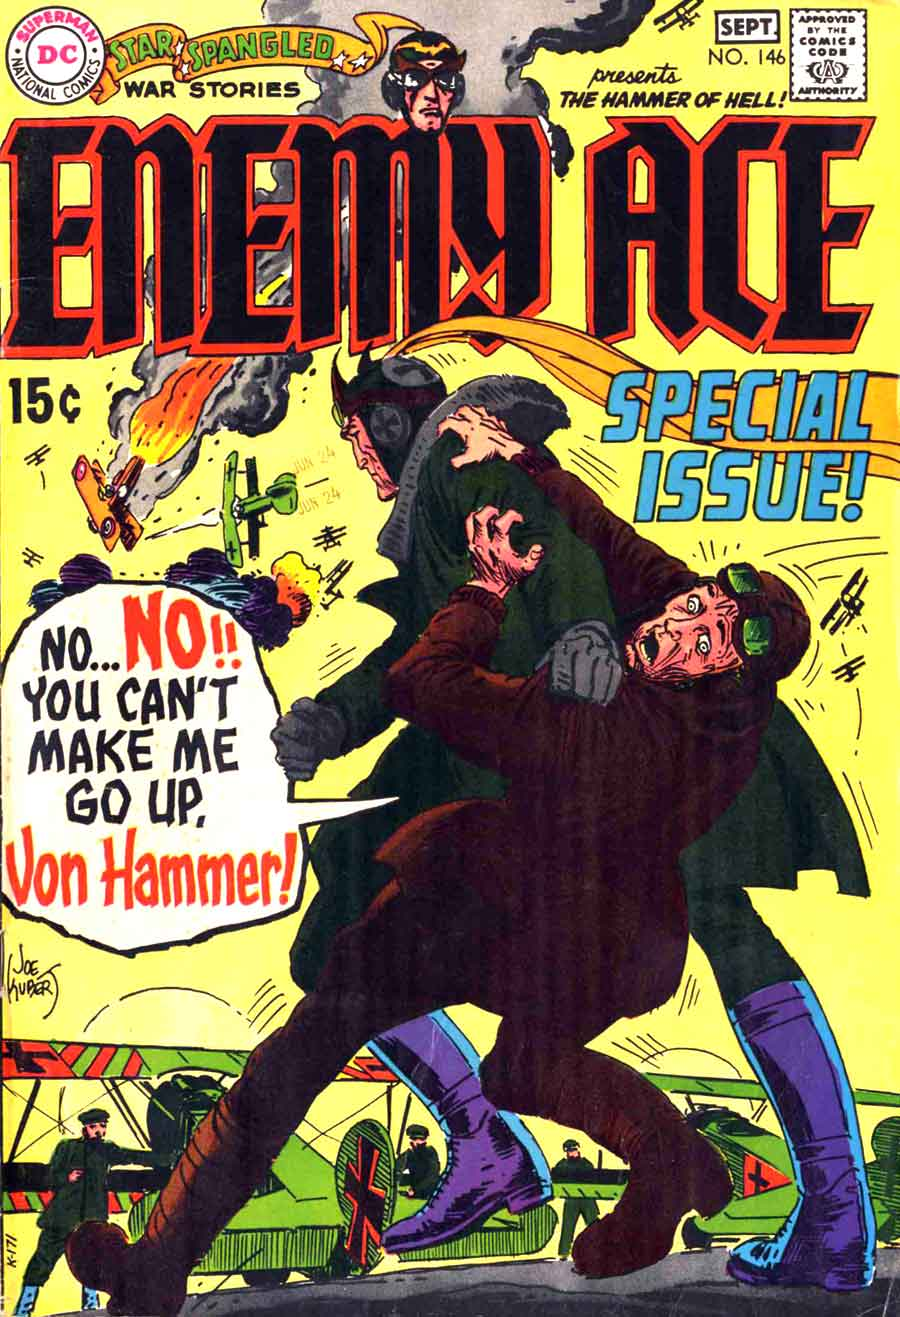 Star Spangled War v1 #146 enemy ace dc comic book cover art by Joe Kubert